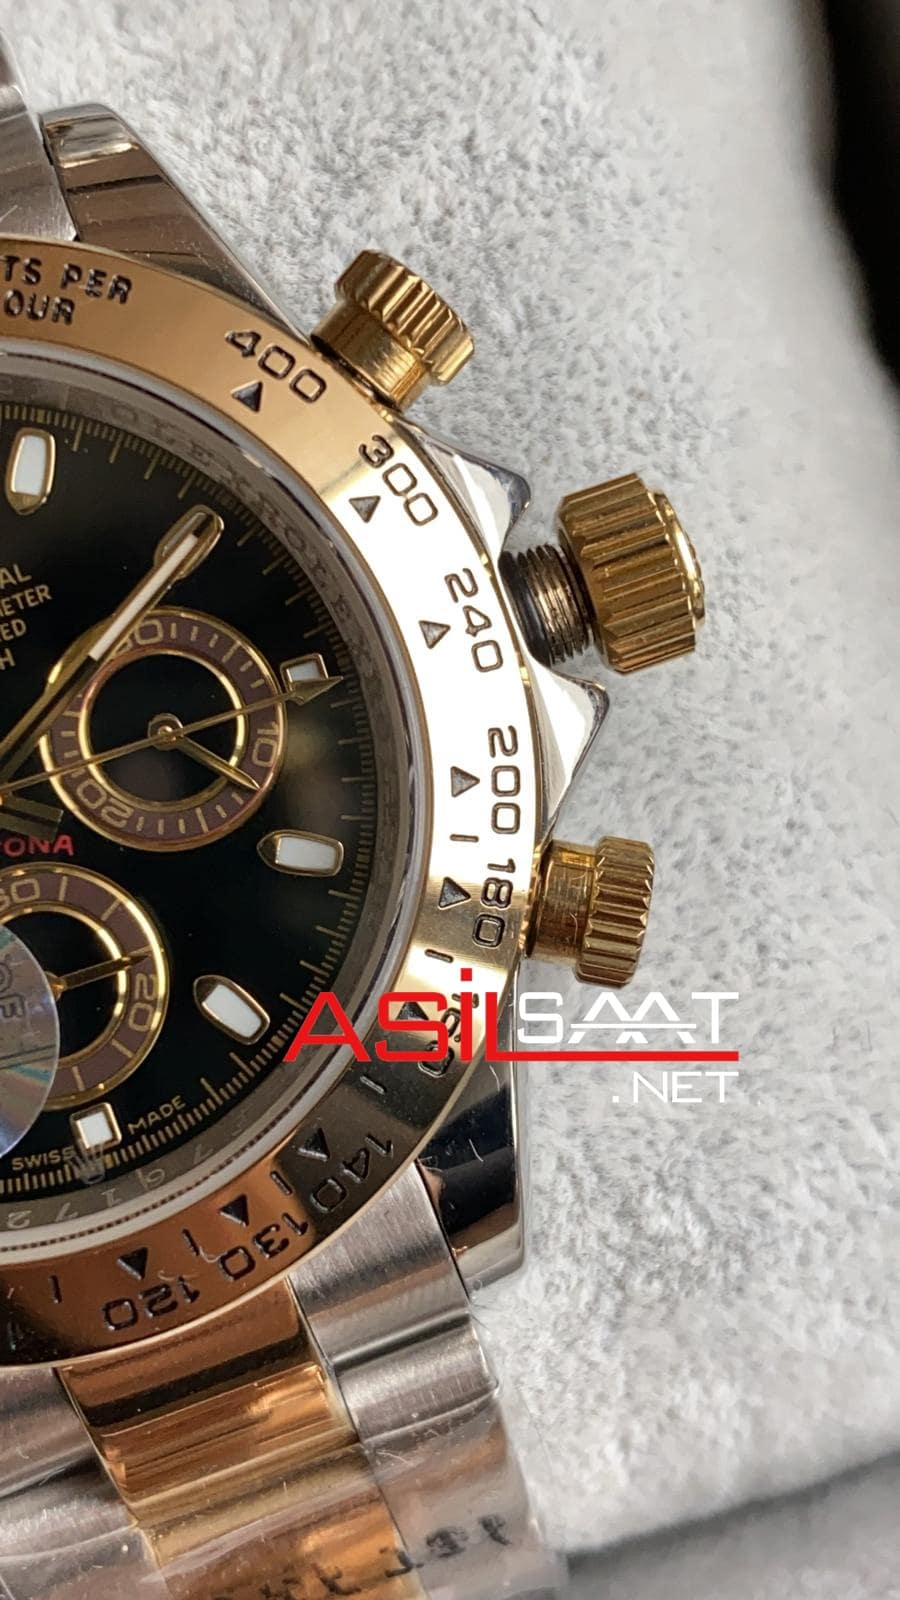 Rolex Oyster Perpetual Cosmograph Daytona Two Tone Replika Saat ROLDA012